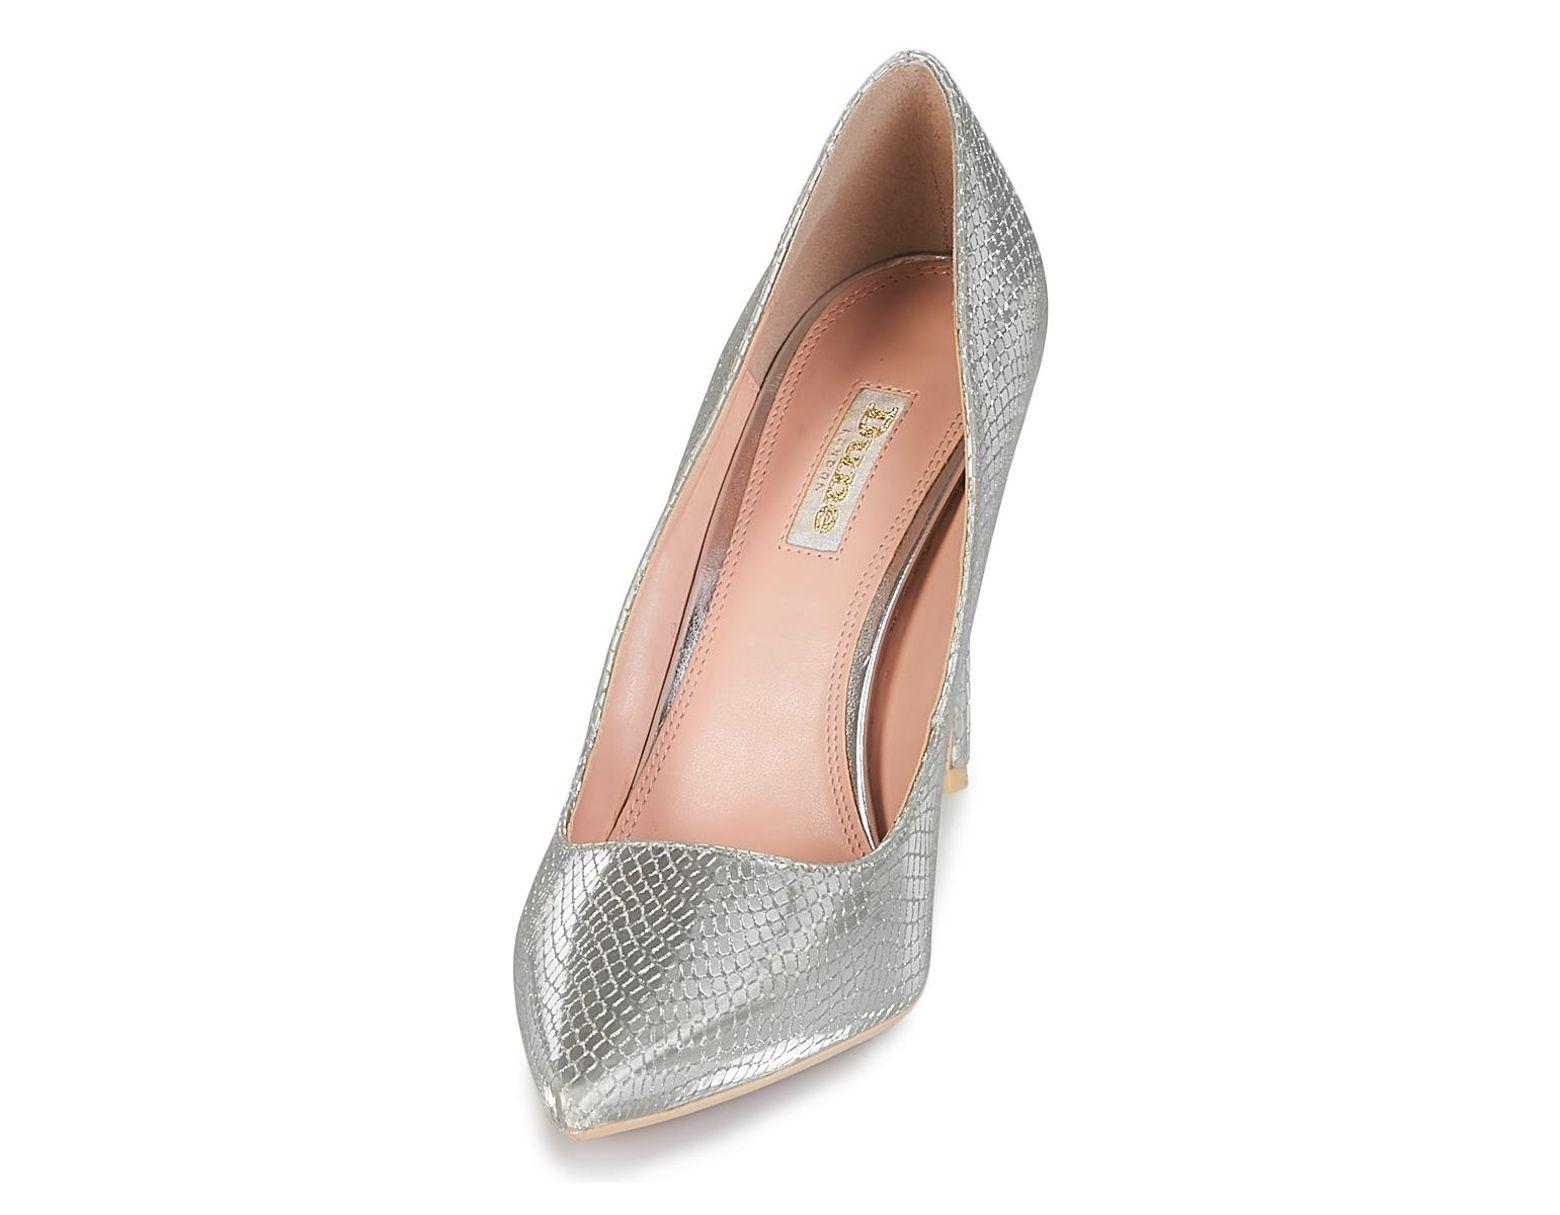 Dune Metallic Women's Shoes In Court Silver Amalfie Lyst WH2D9EI